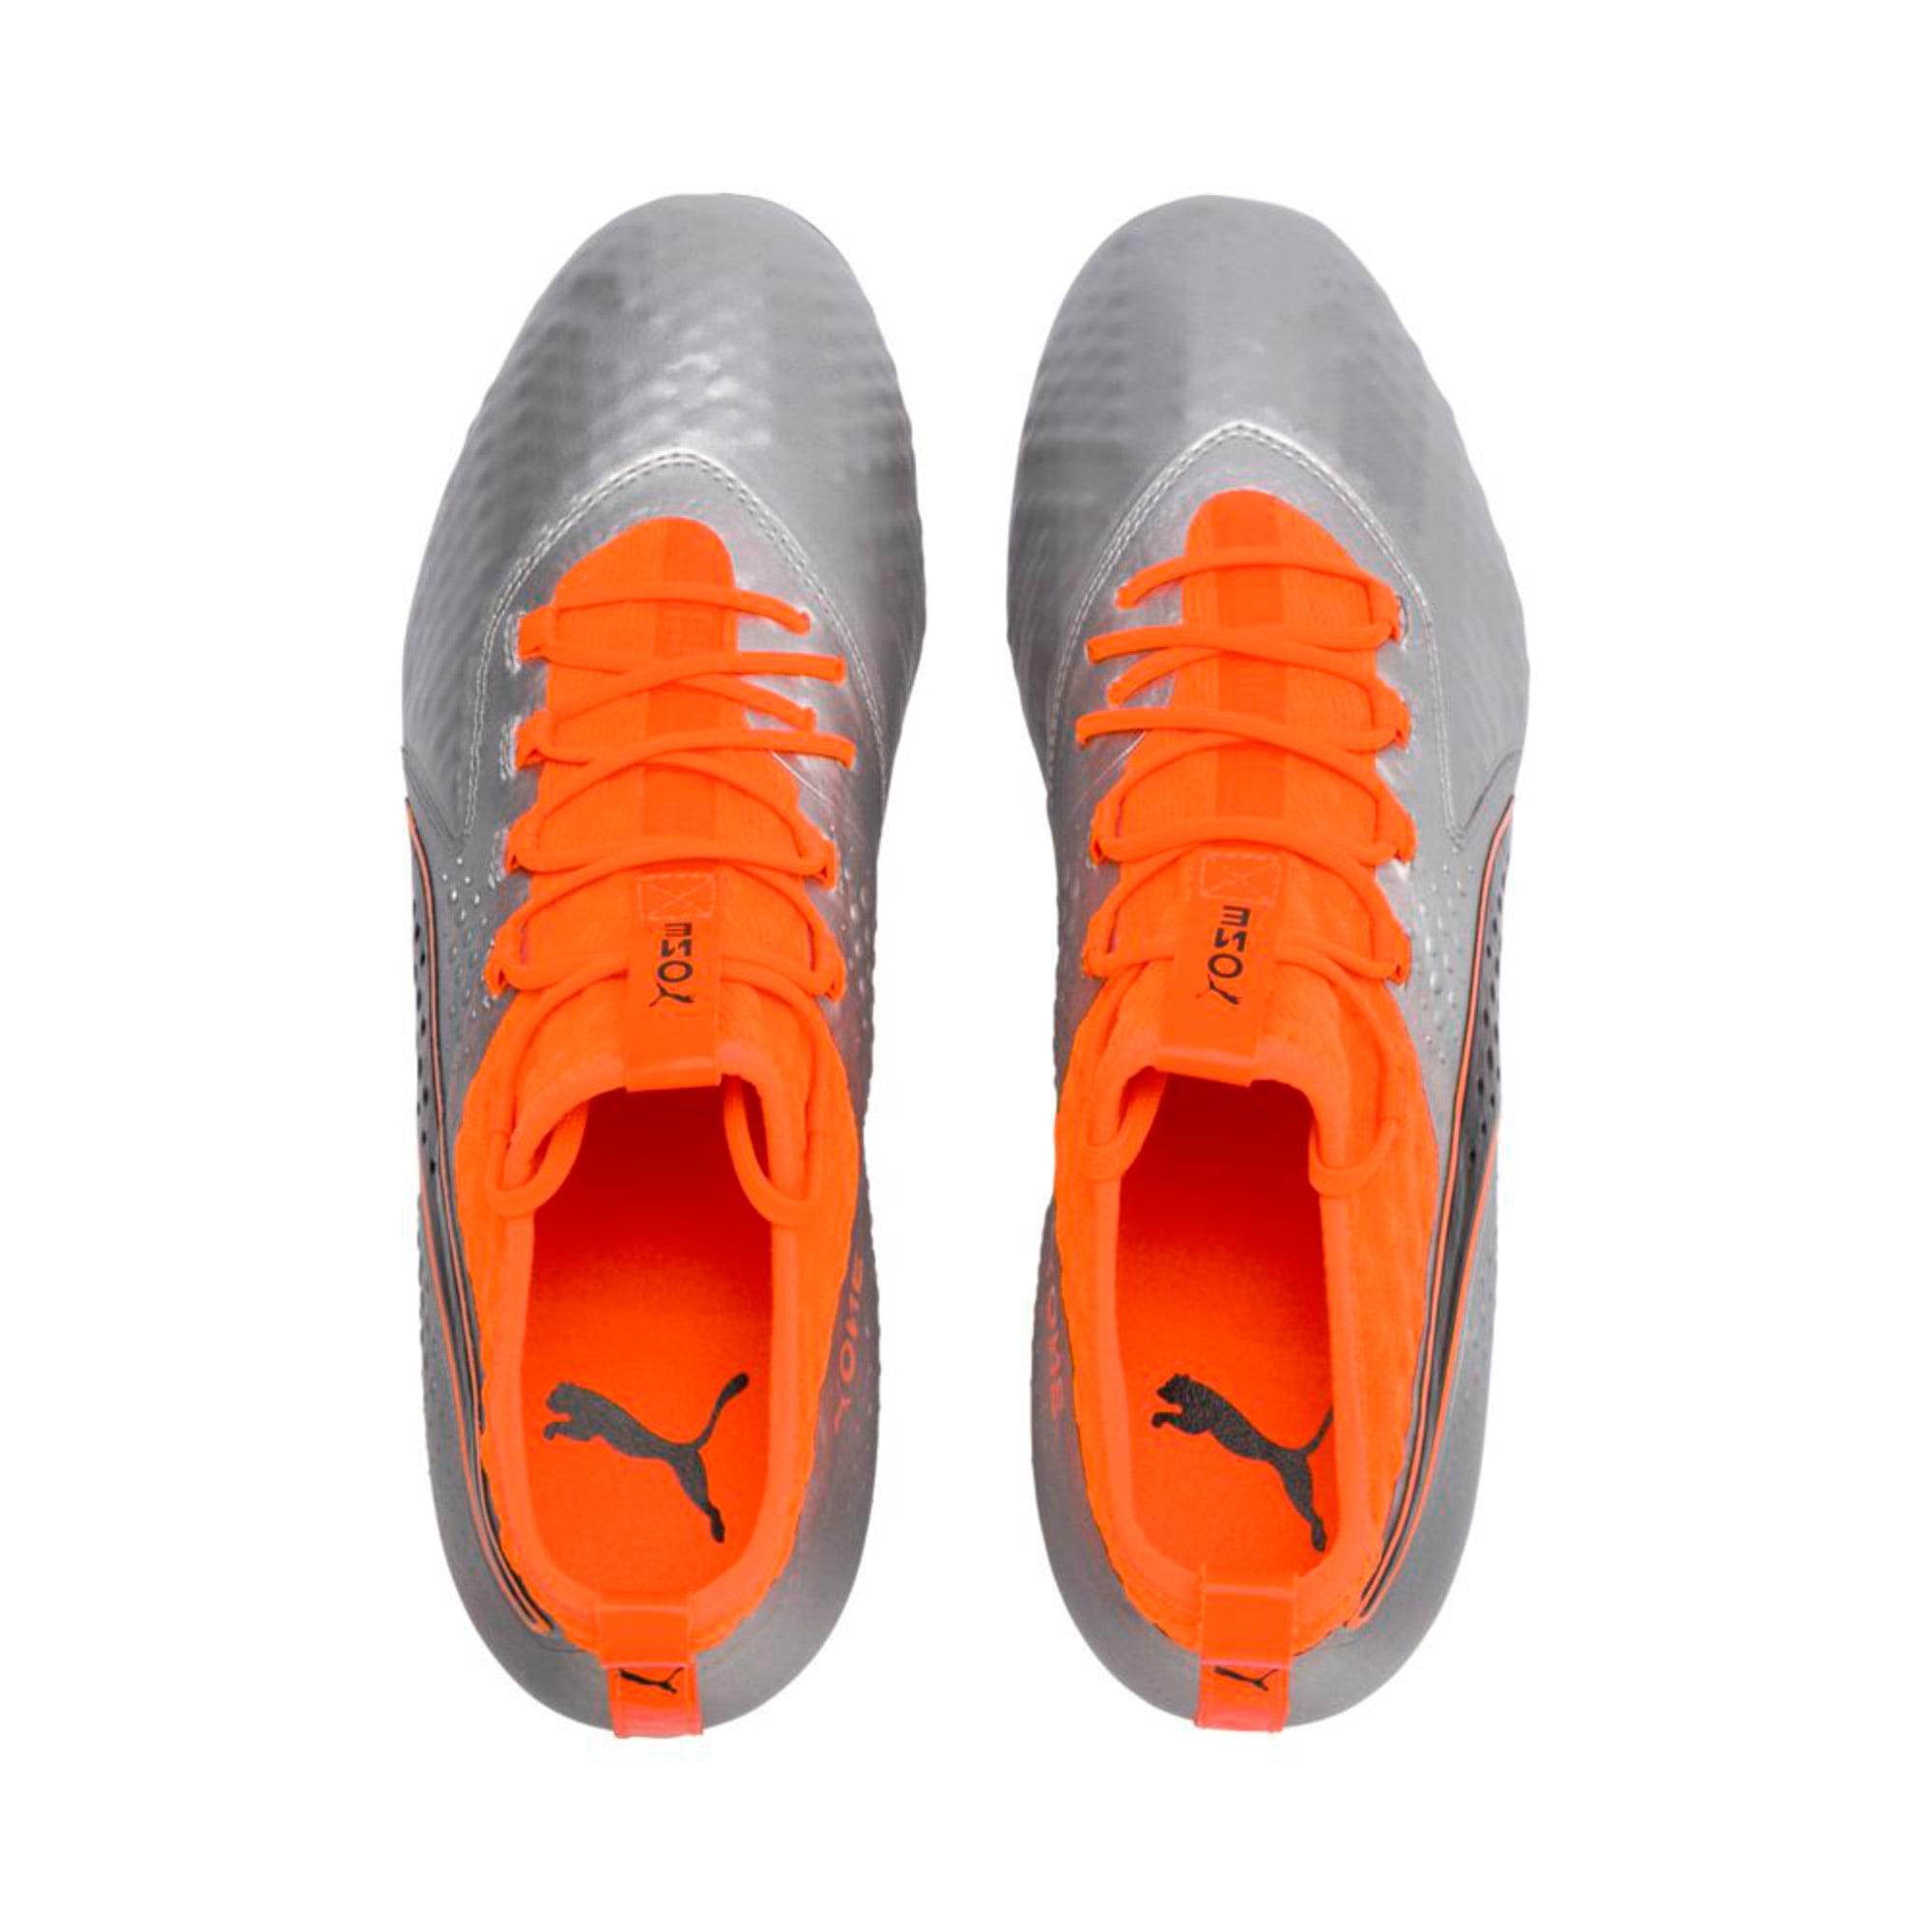 Thumbnail 3 of PUMA ONE 2 Leather FG  Football Boots, Silver-Orange-Black, medium-IND